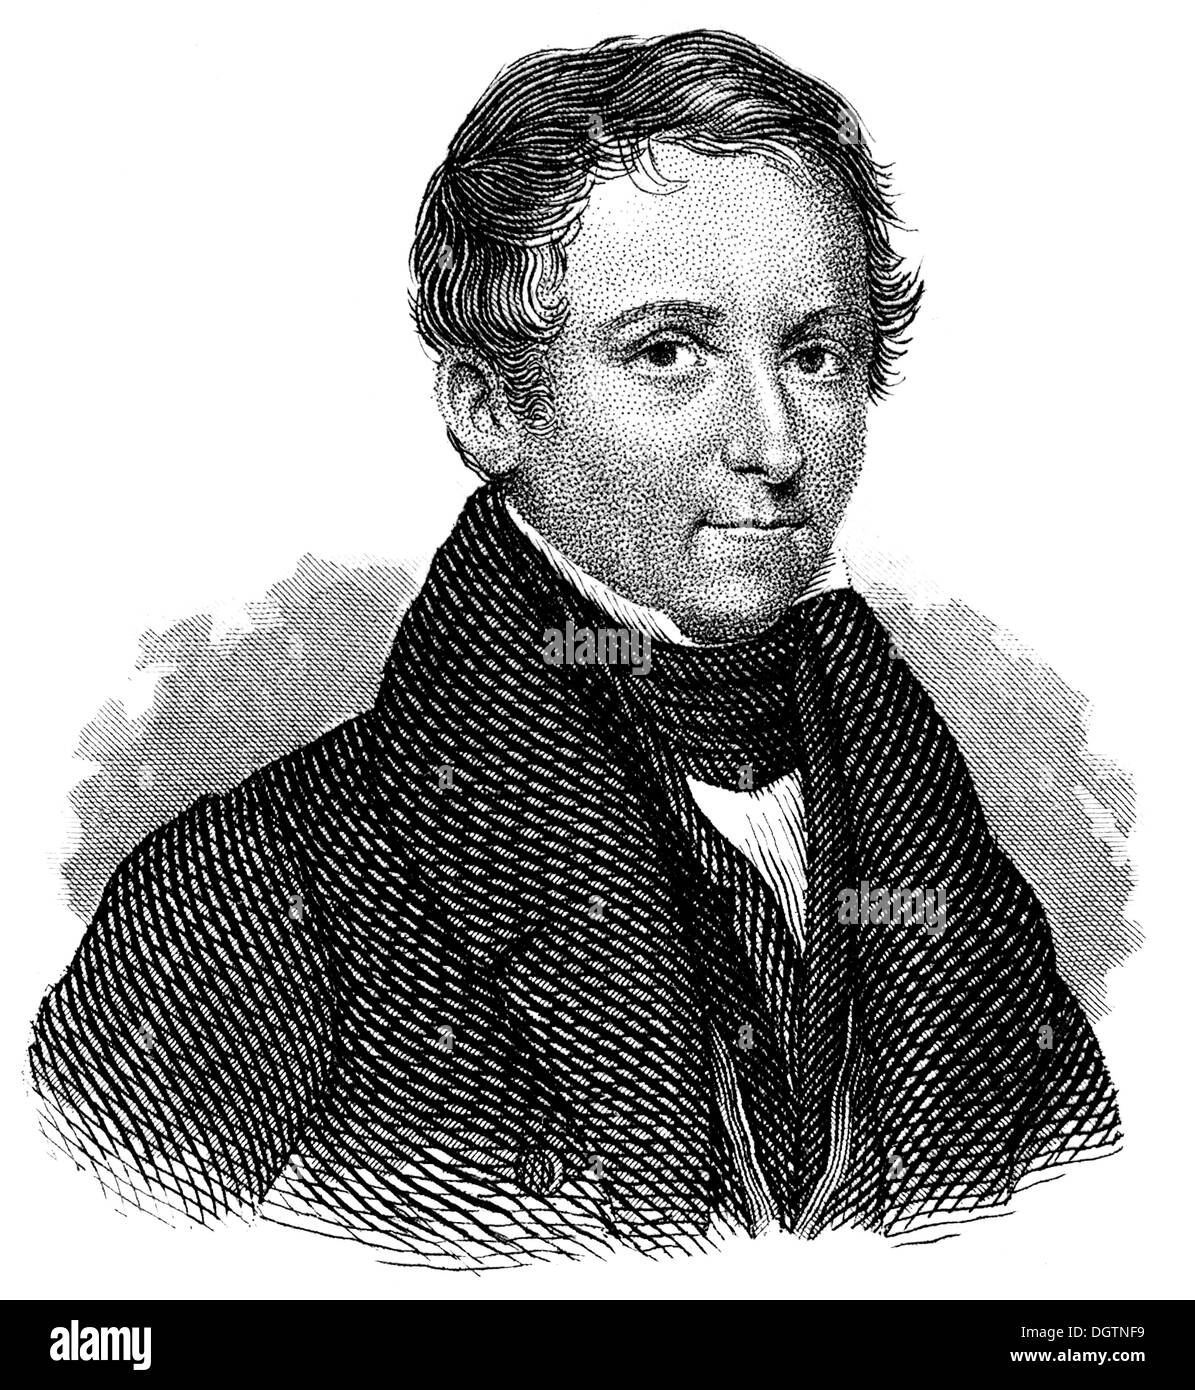 Vincenz Priessnitz or Prießnitz 1799-1851 the founder of modern hydrotherapy Stock Photo